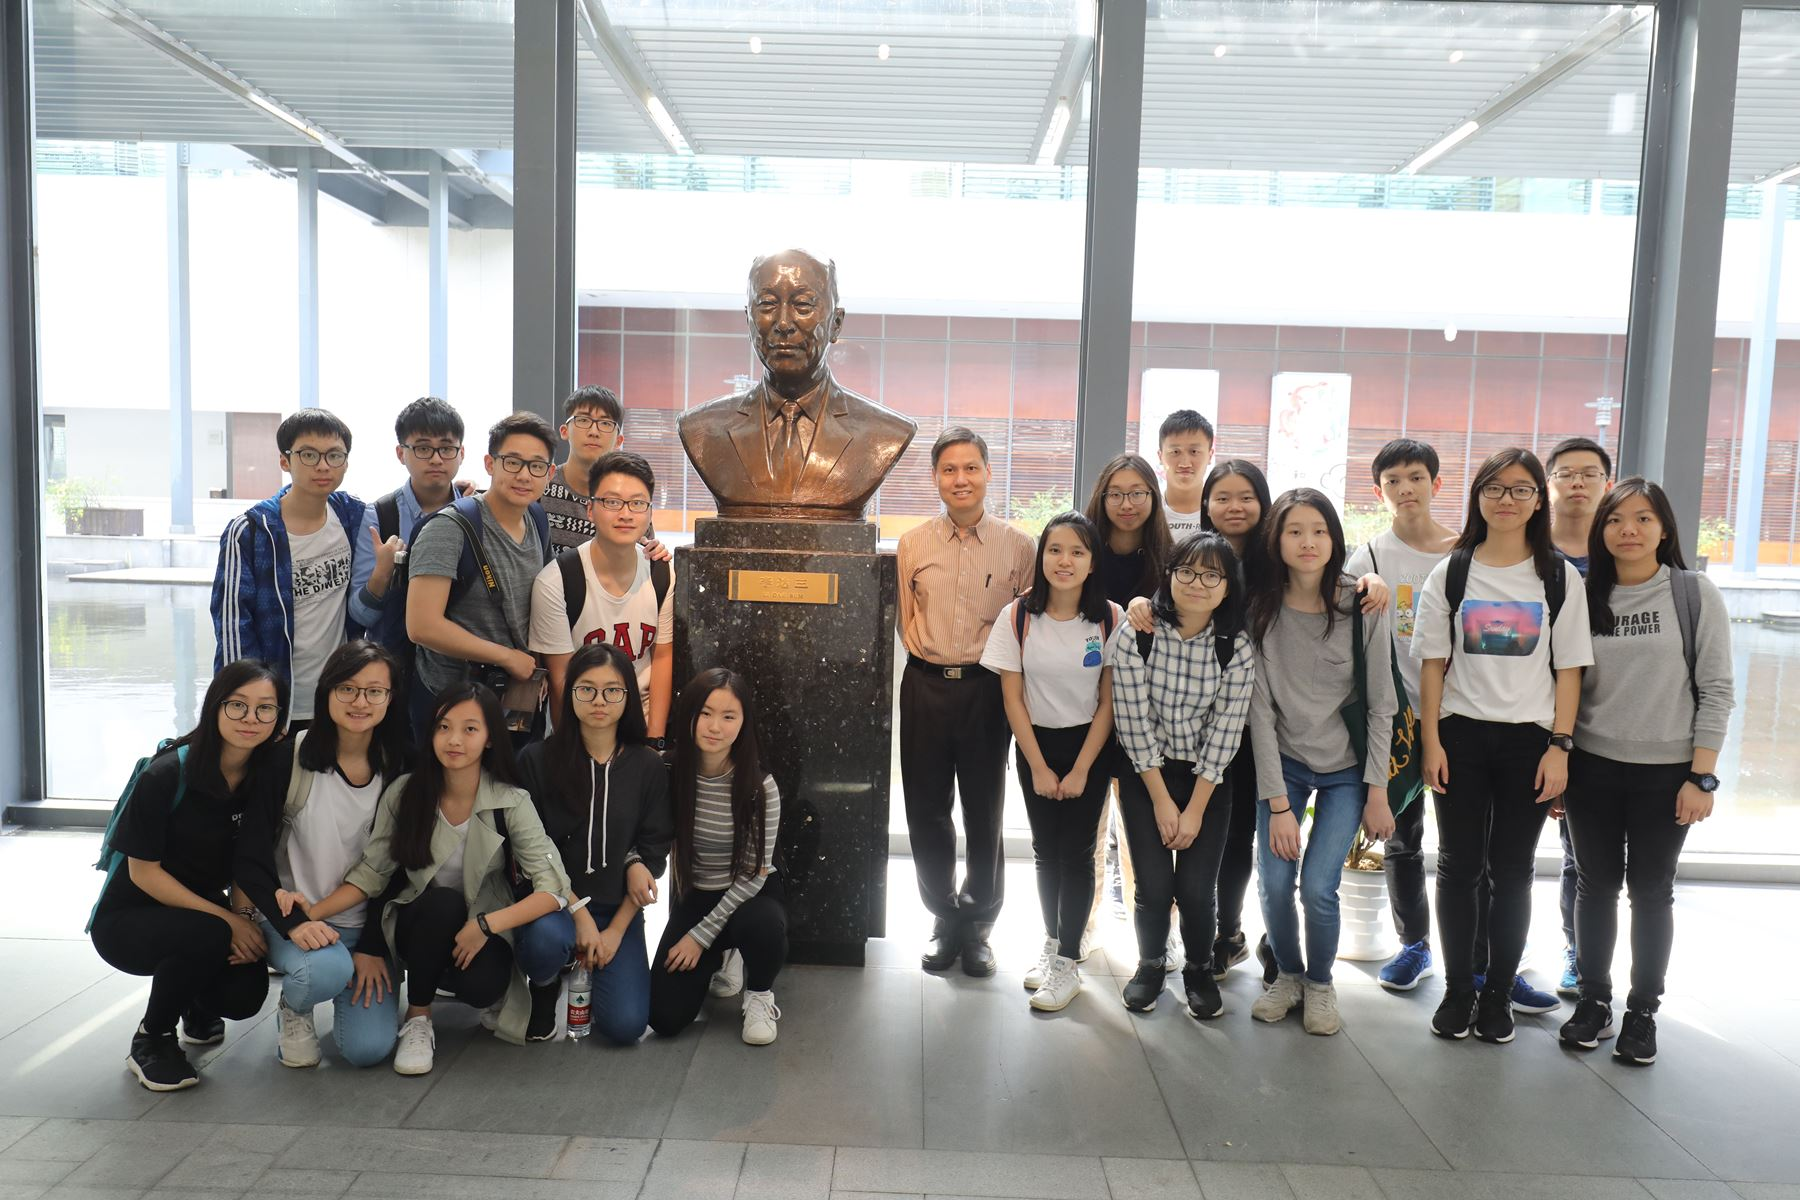 http://npc.edu.hk/sites/default/files/25_36.jpg